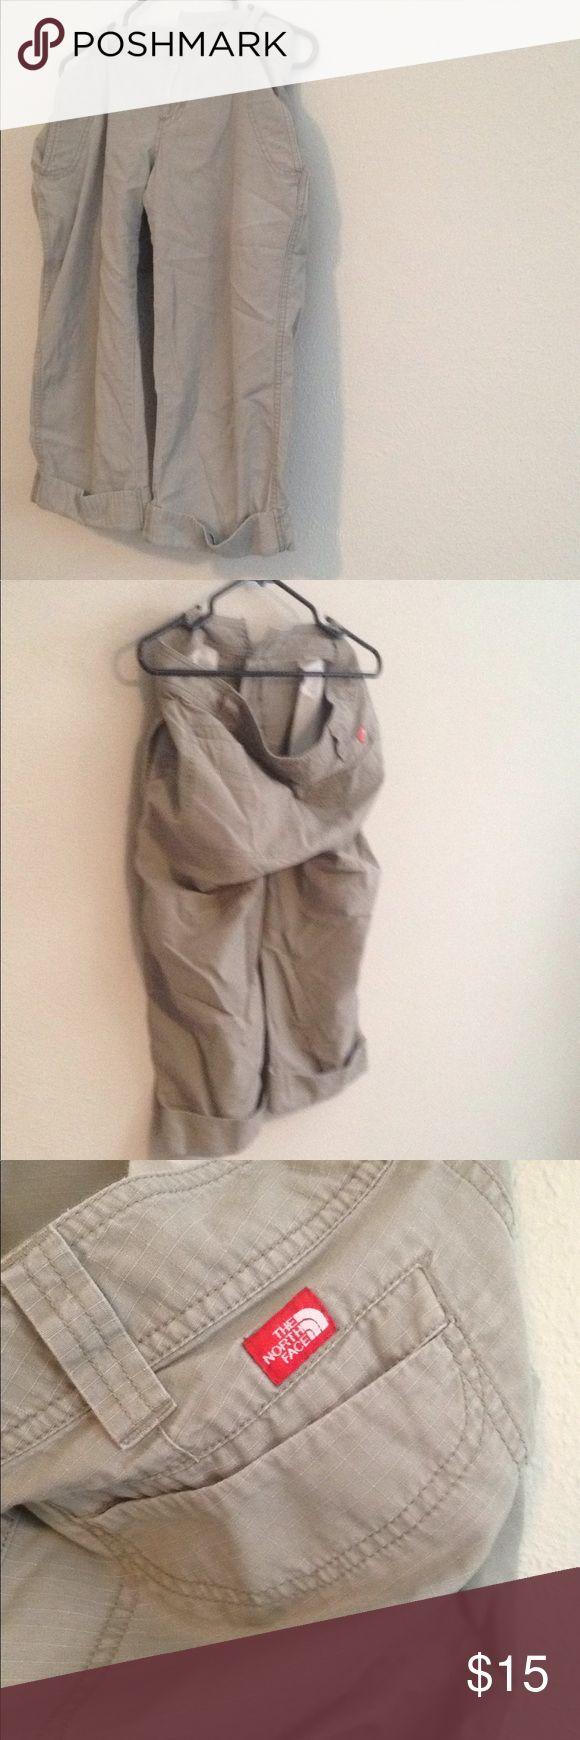 Women's khaki capris Wonderful pair of women's North Face capris with hook clasps in excellent condition The North Face Pants Capris